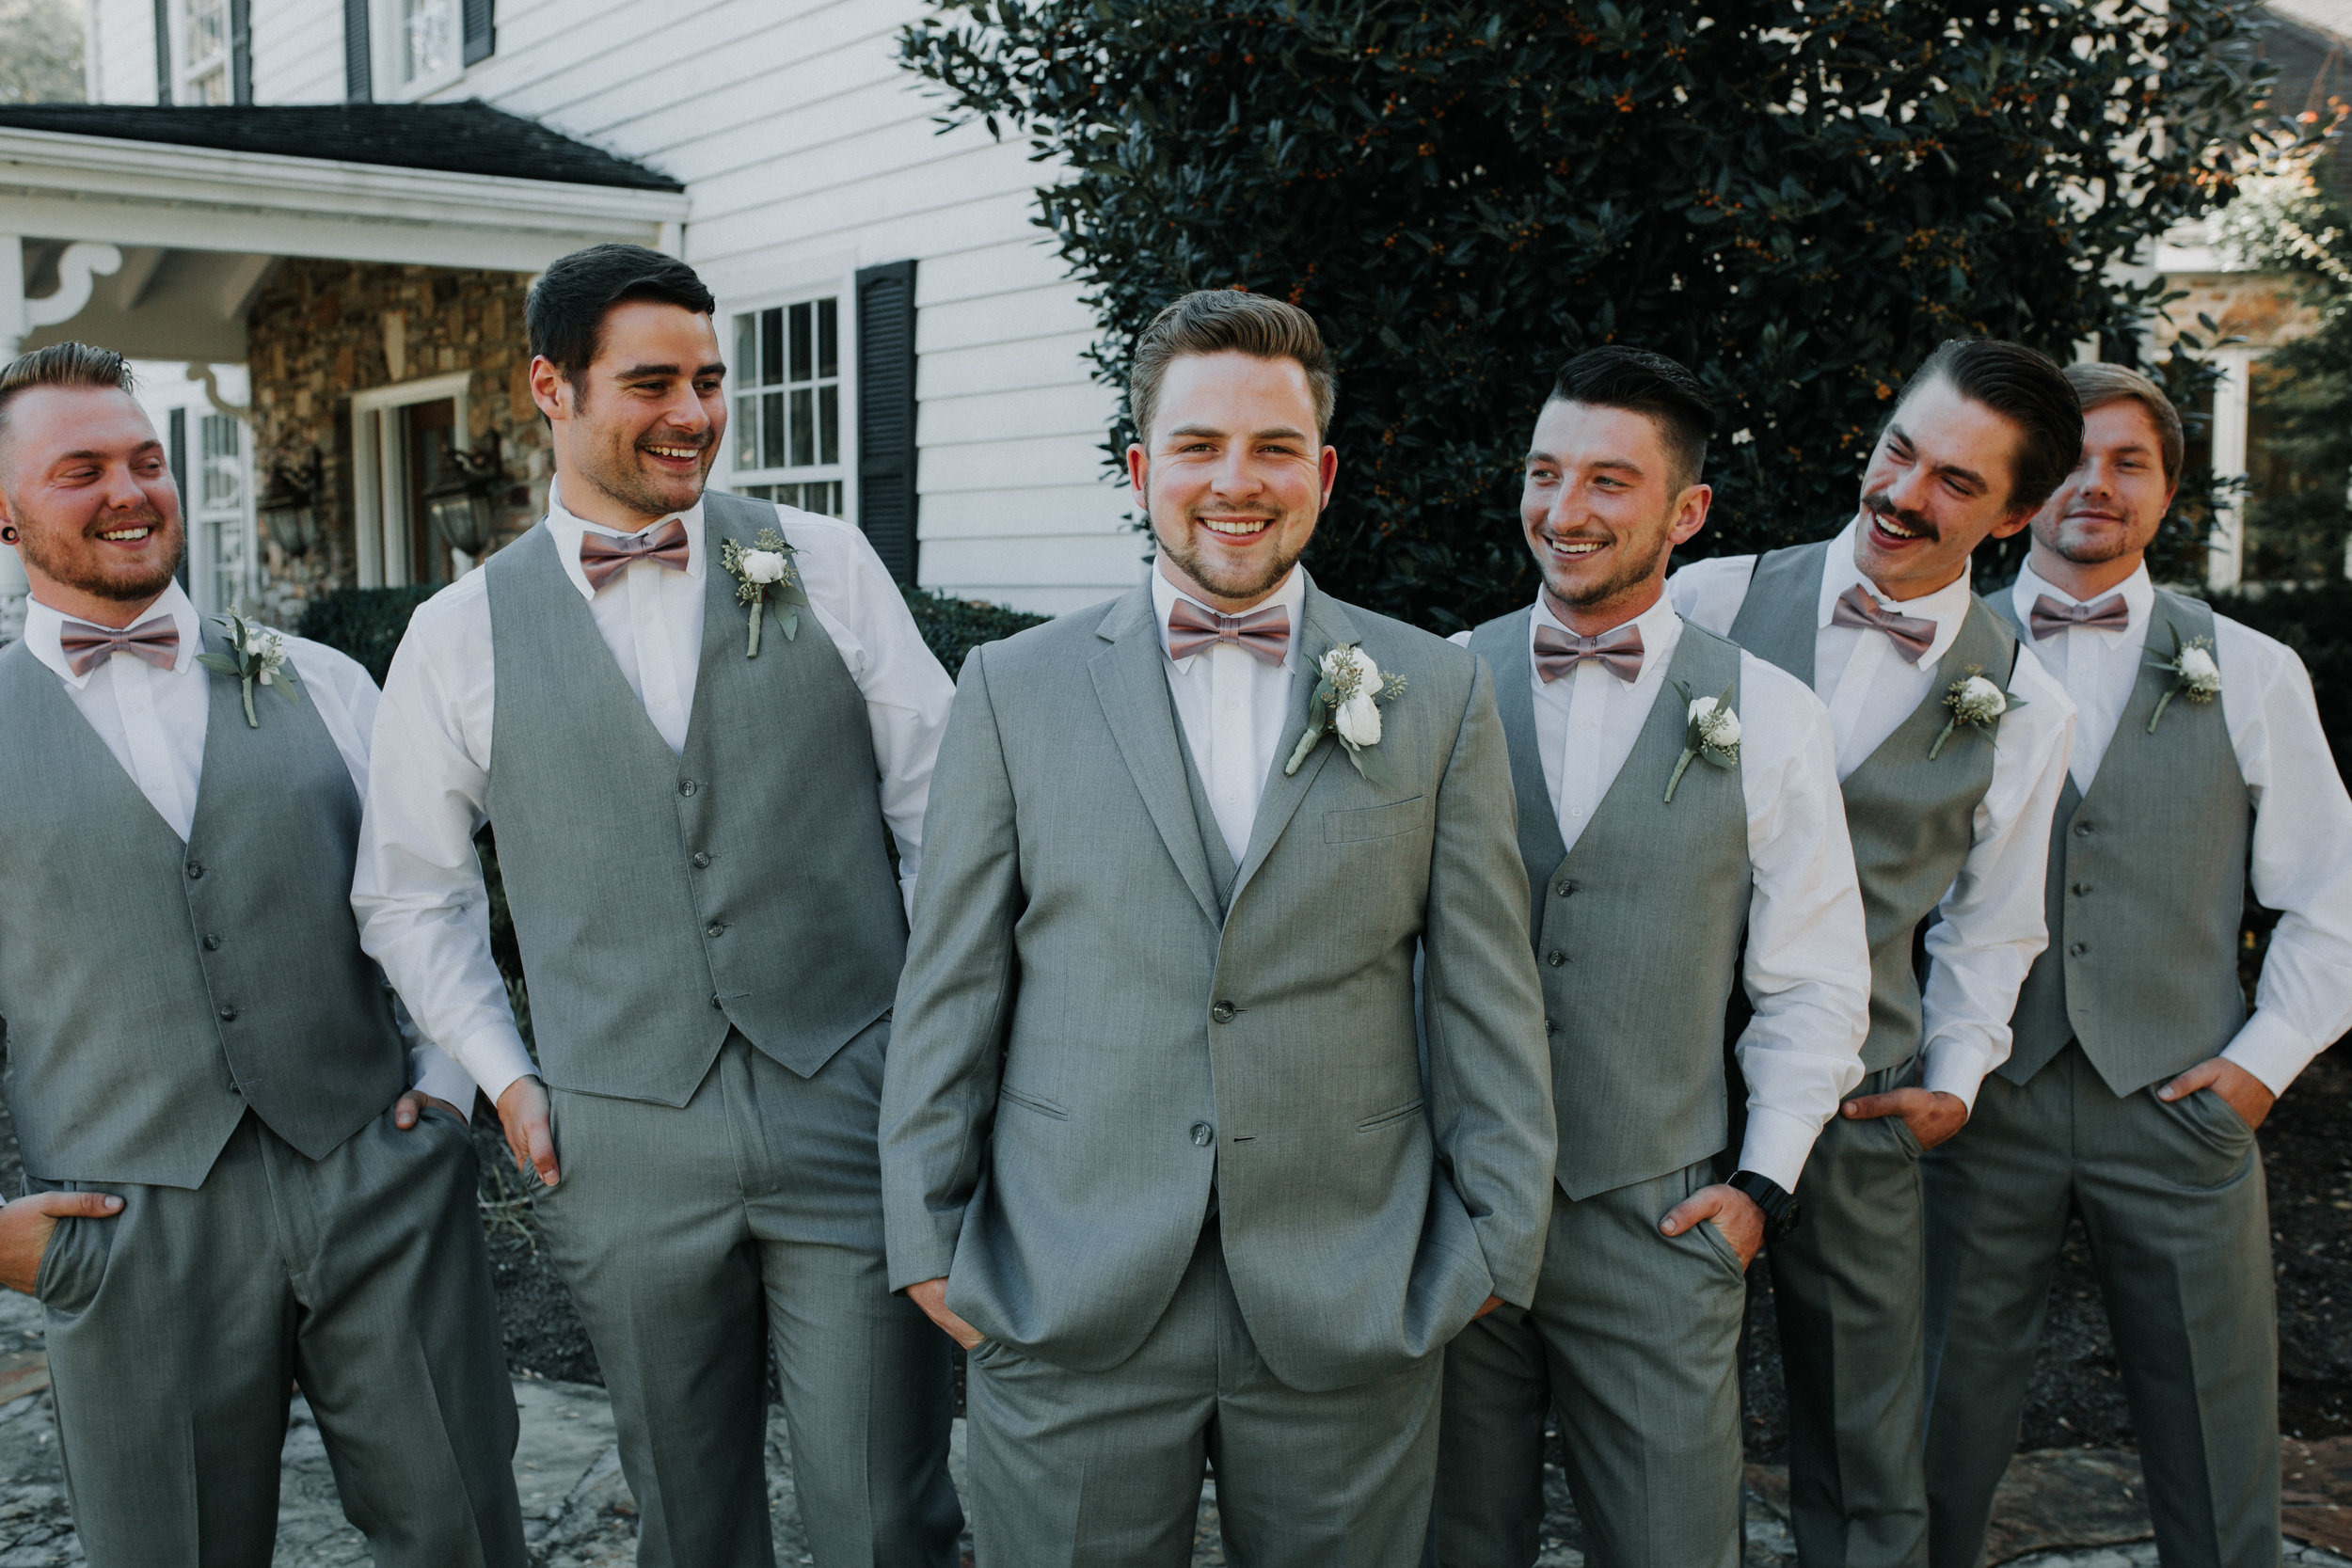 Groomsmen Online Rentals - Dara's Garden Knoxville East Tennessee Wedding — The Overwhelmed Bride Wedding Blog